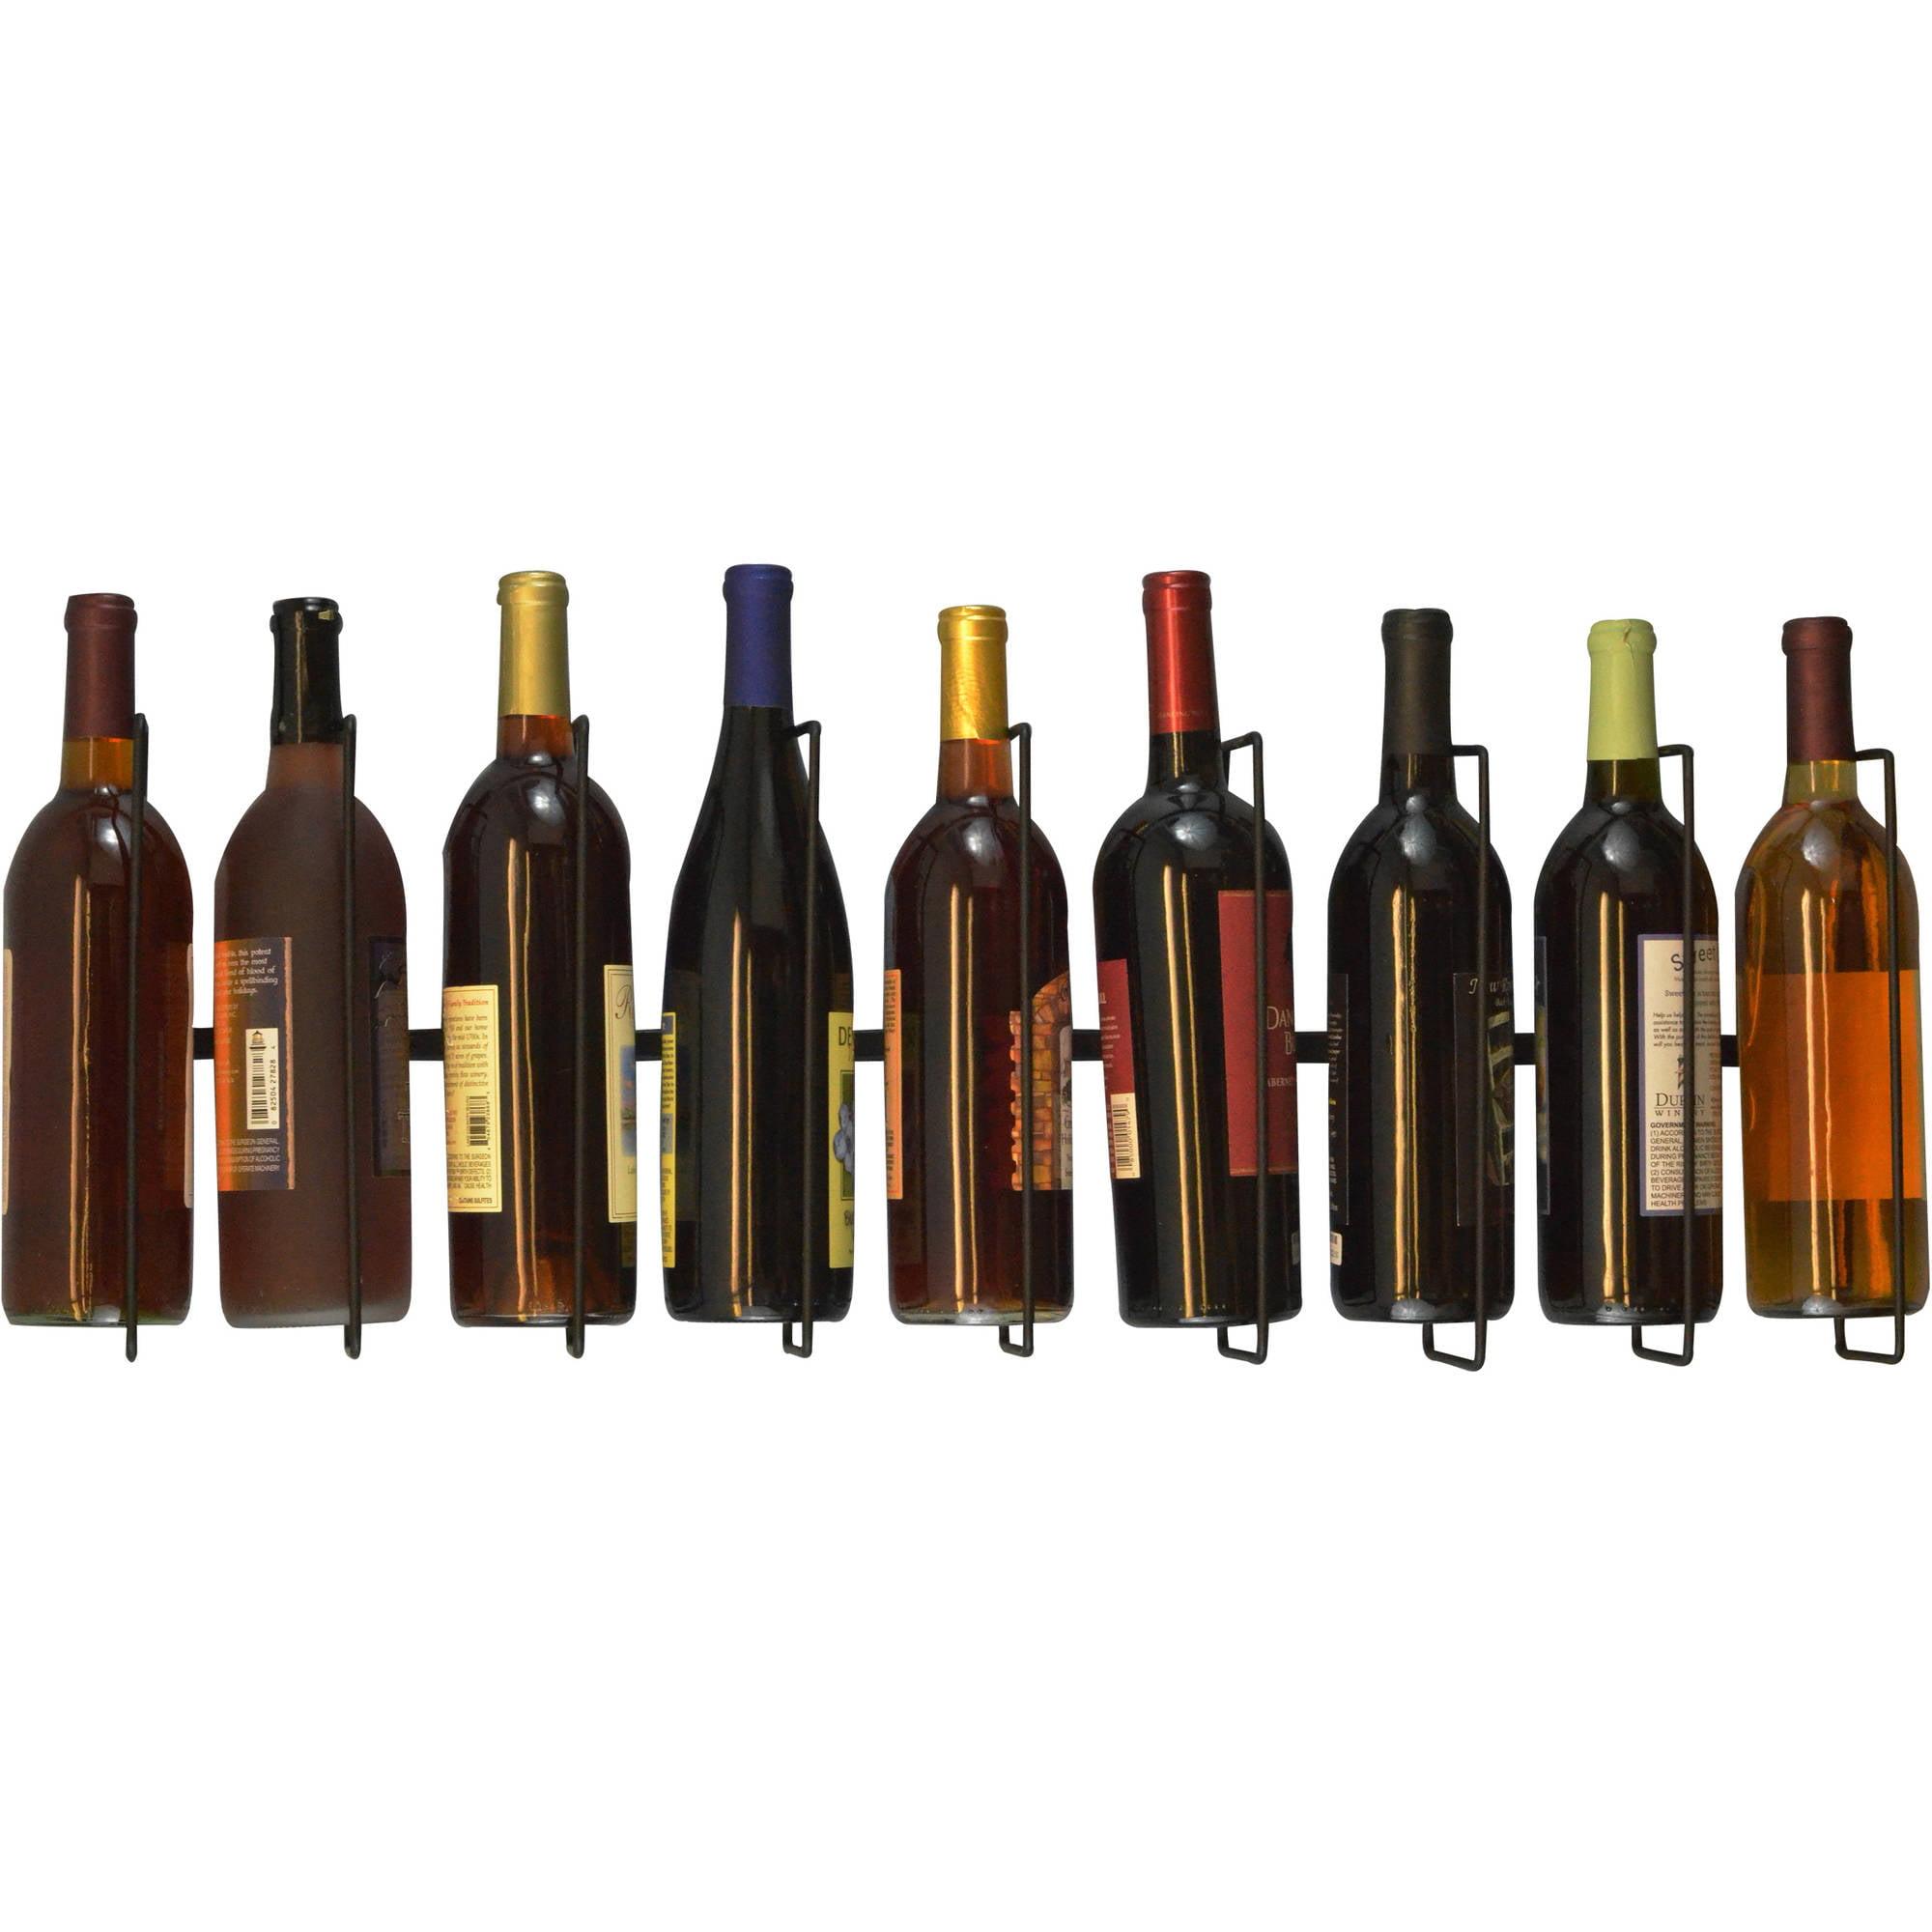 Wall Mount Wine Bottle Storage Rack Holds Bar Organizer Black CHRISTMAS GIFT